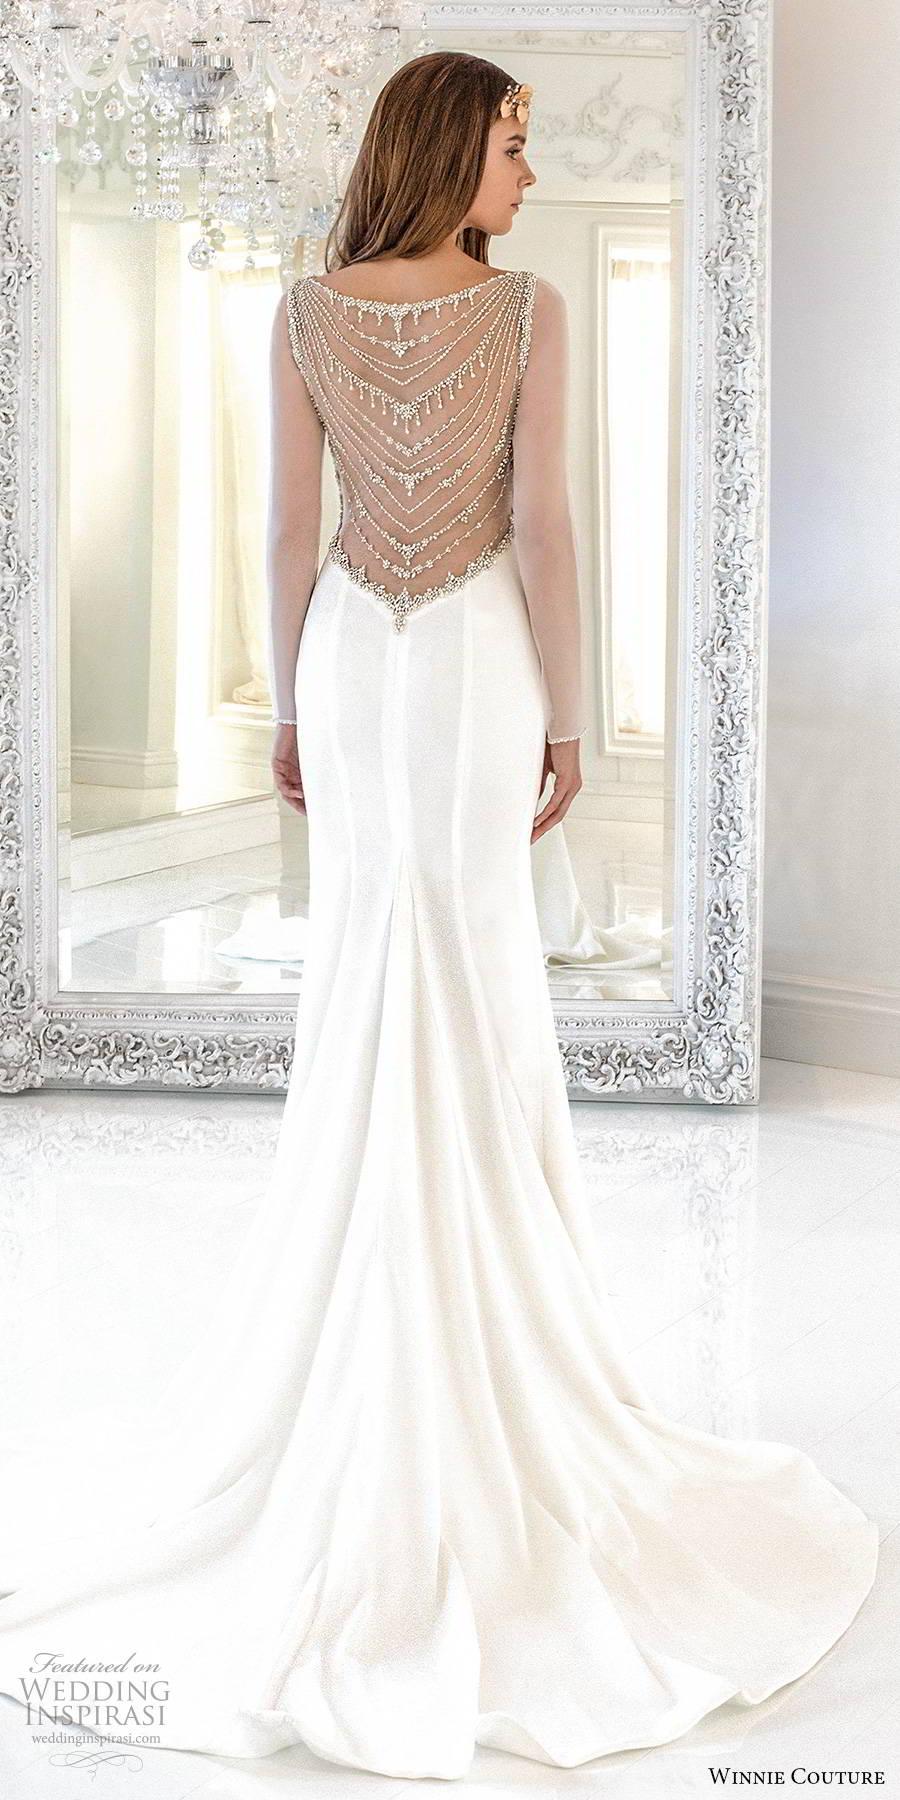 winnie couture 2019 bridal sheer long sleeves bateau neckline clean minimalist sheath glam wedding dress illusion back chapel train (14) bv